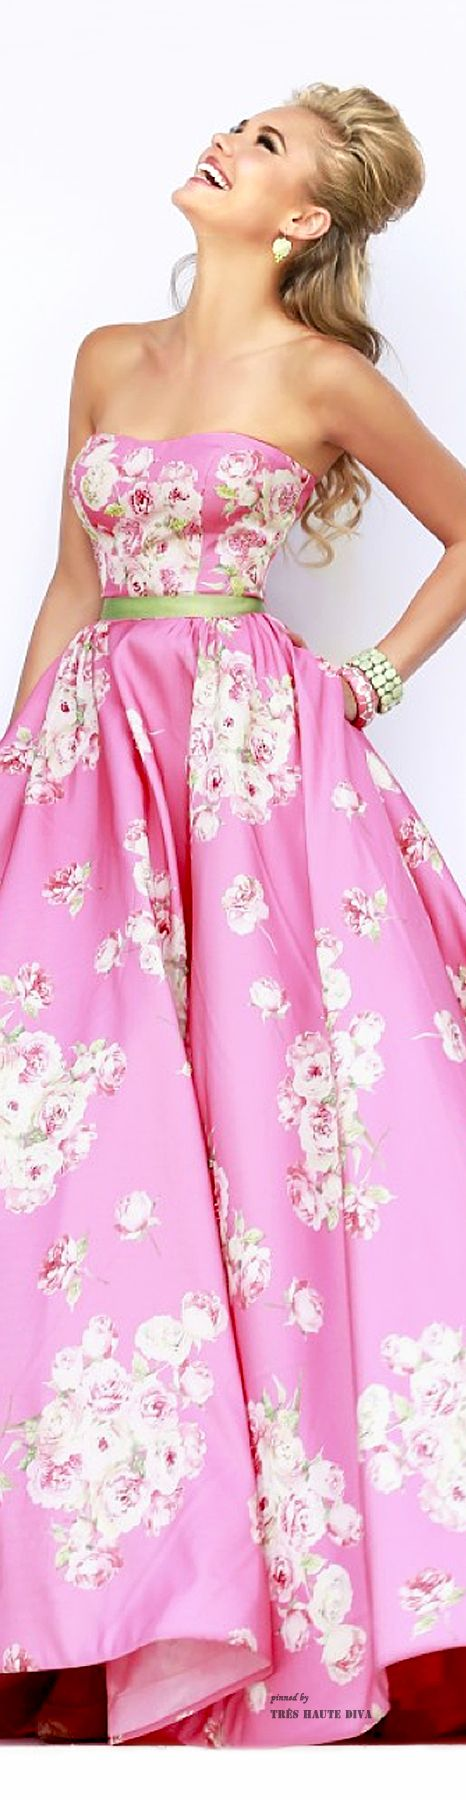 Pink Wedding ♔ Sherri Hill Spring 2015 ♔ Très Haute Bride ♔